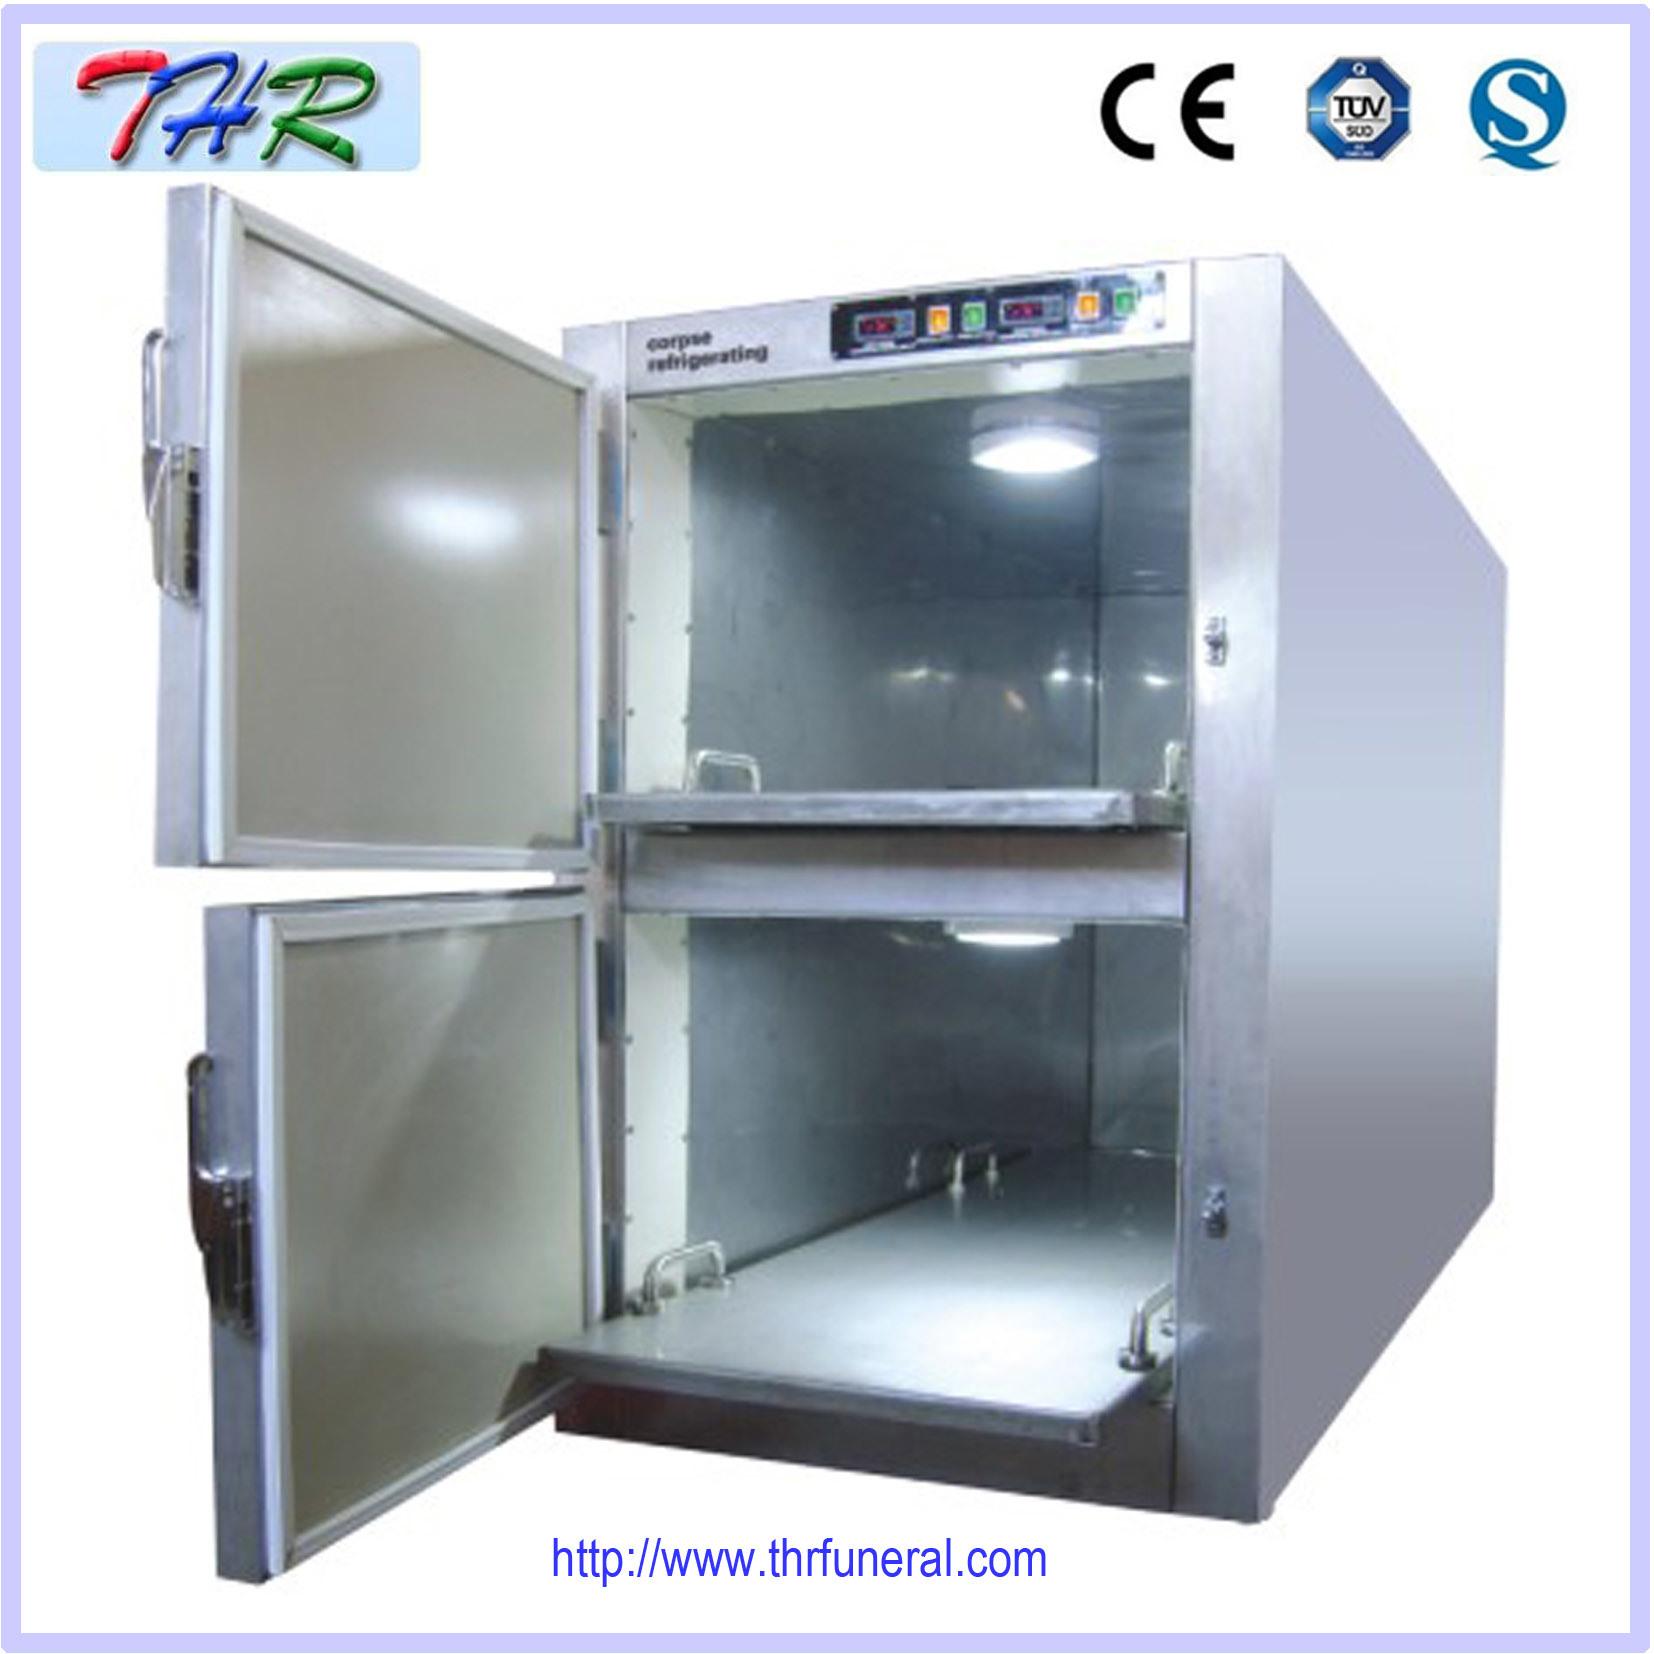 Double Corpse Refrigerator (THR-FR002)